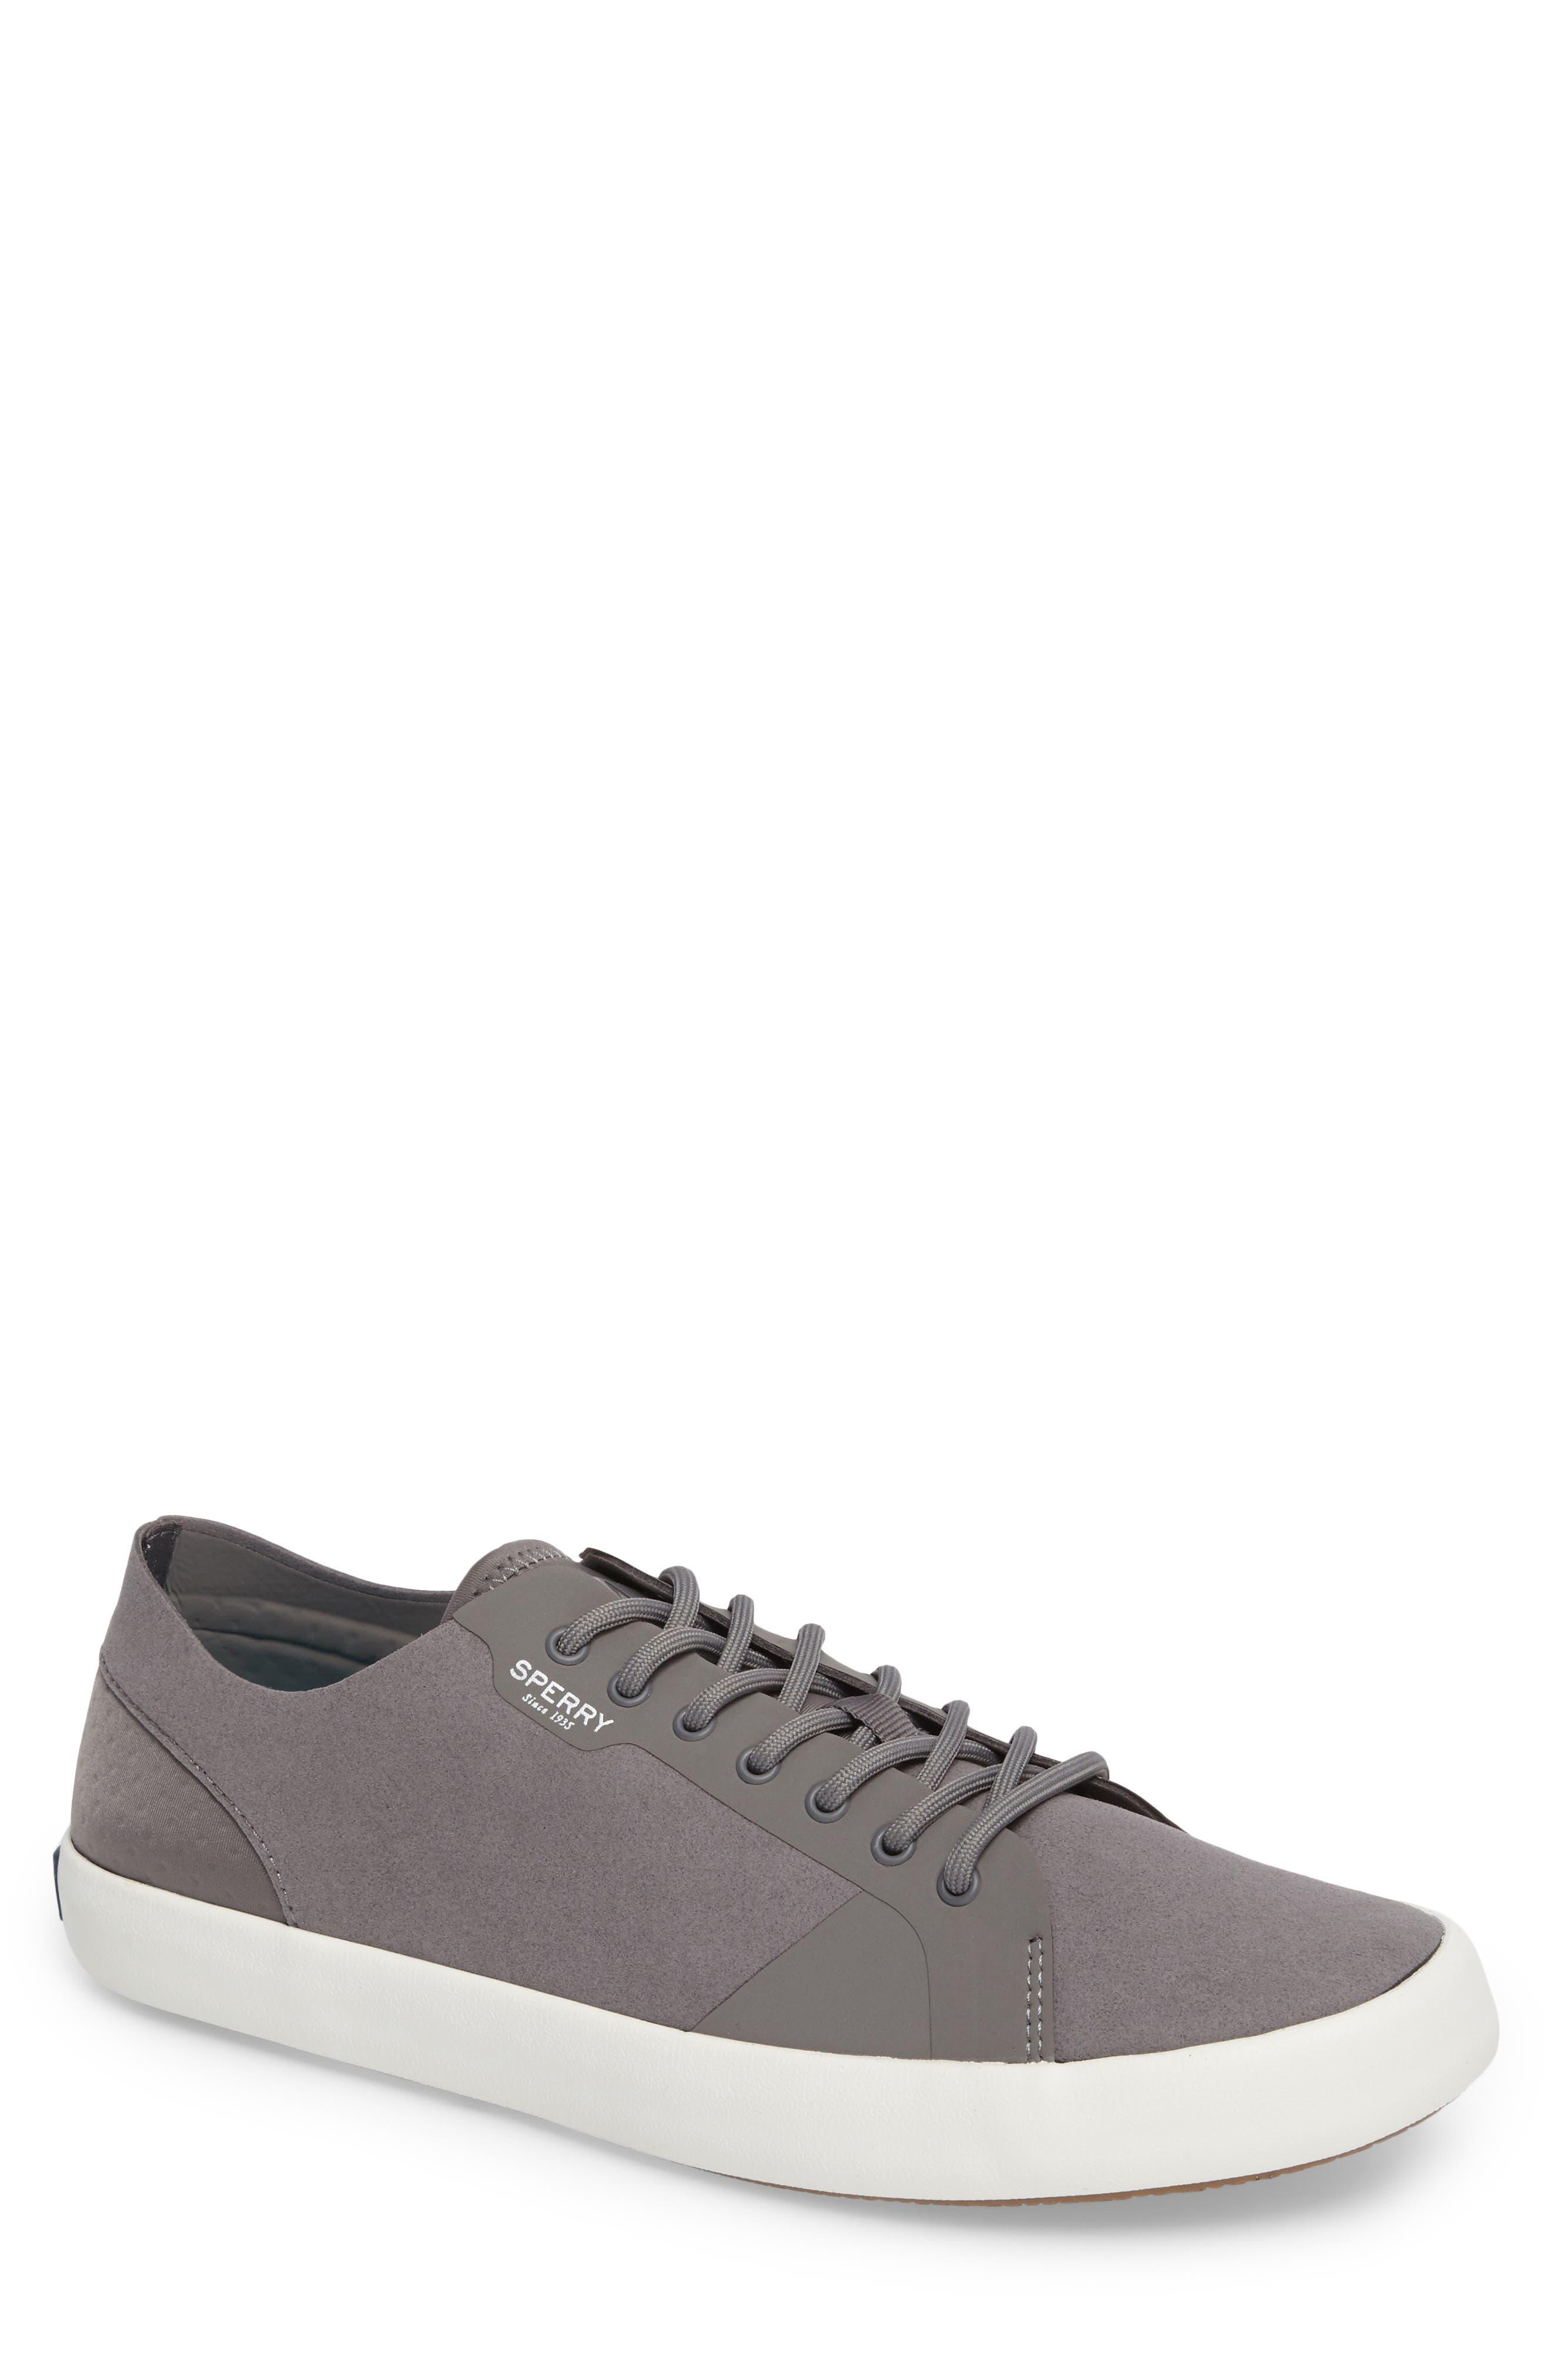 Flex Deck LTT Sneaker,                         Main,                         color, Grey